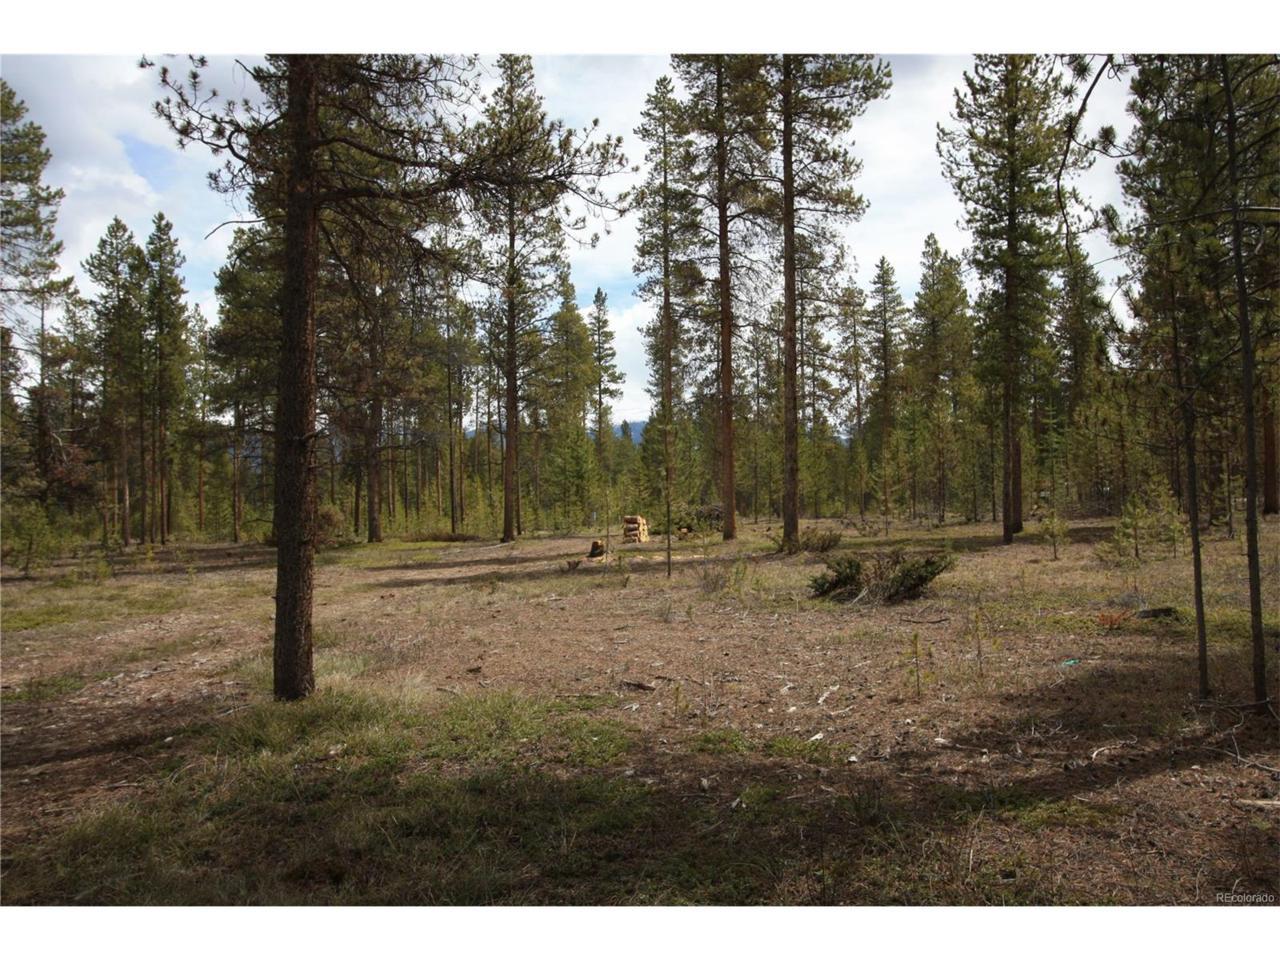 34 County Road 5171B, Fraser, CO 80442 (MLS #5313088) :: 8z Real Estate